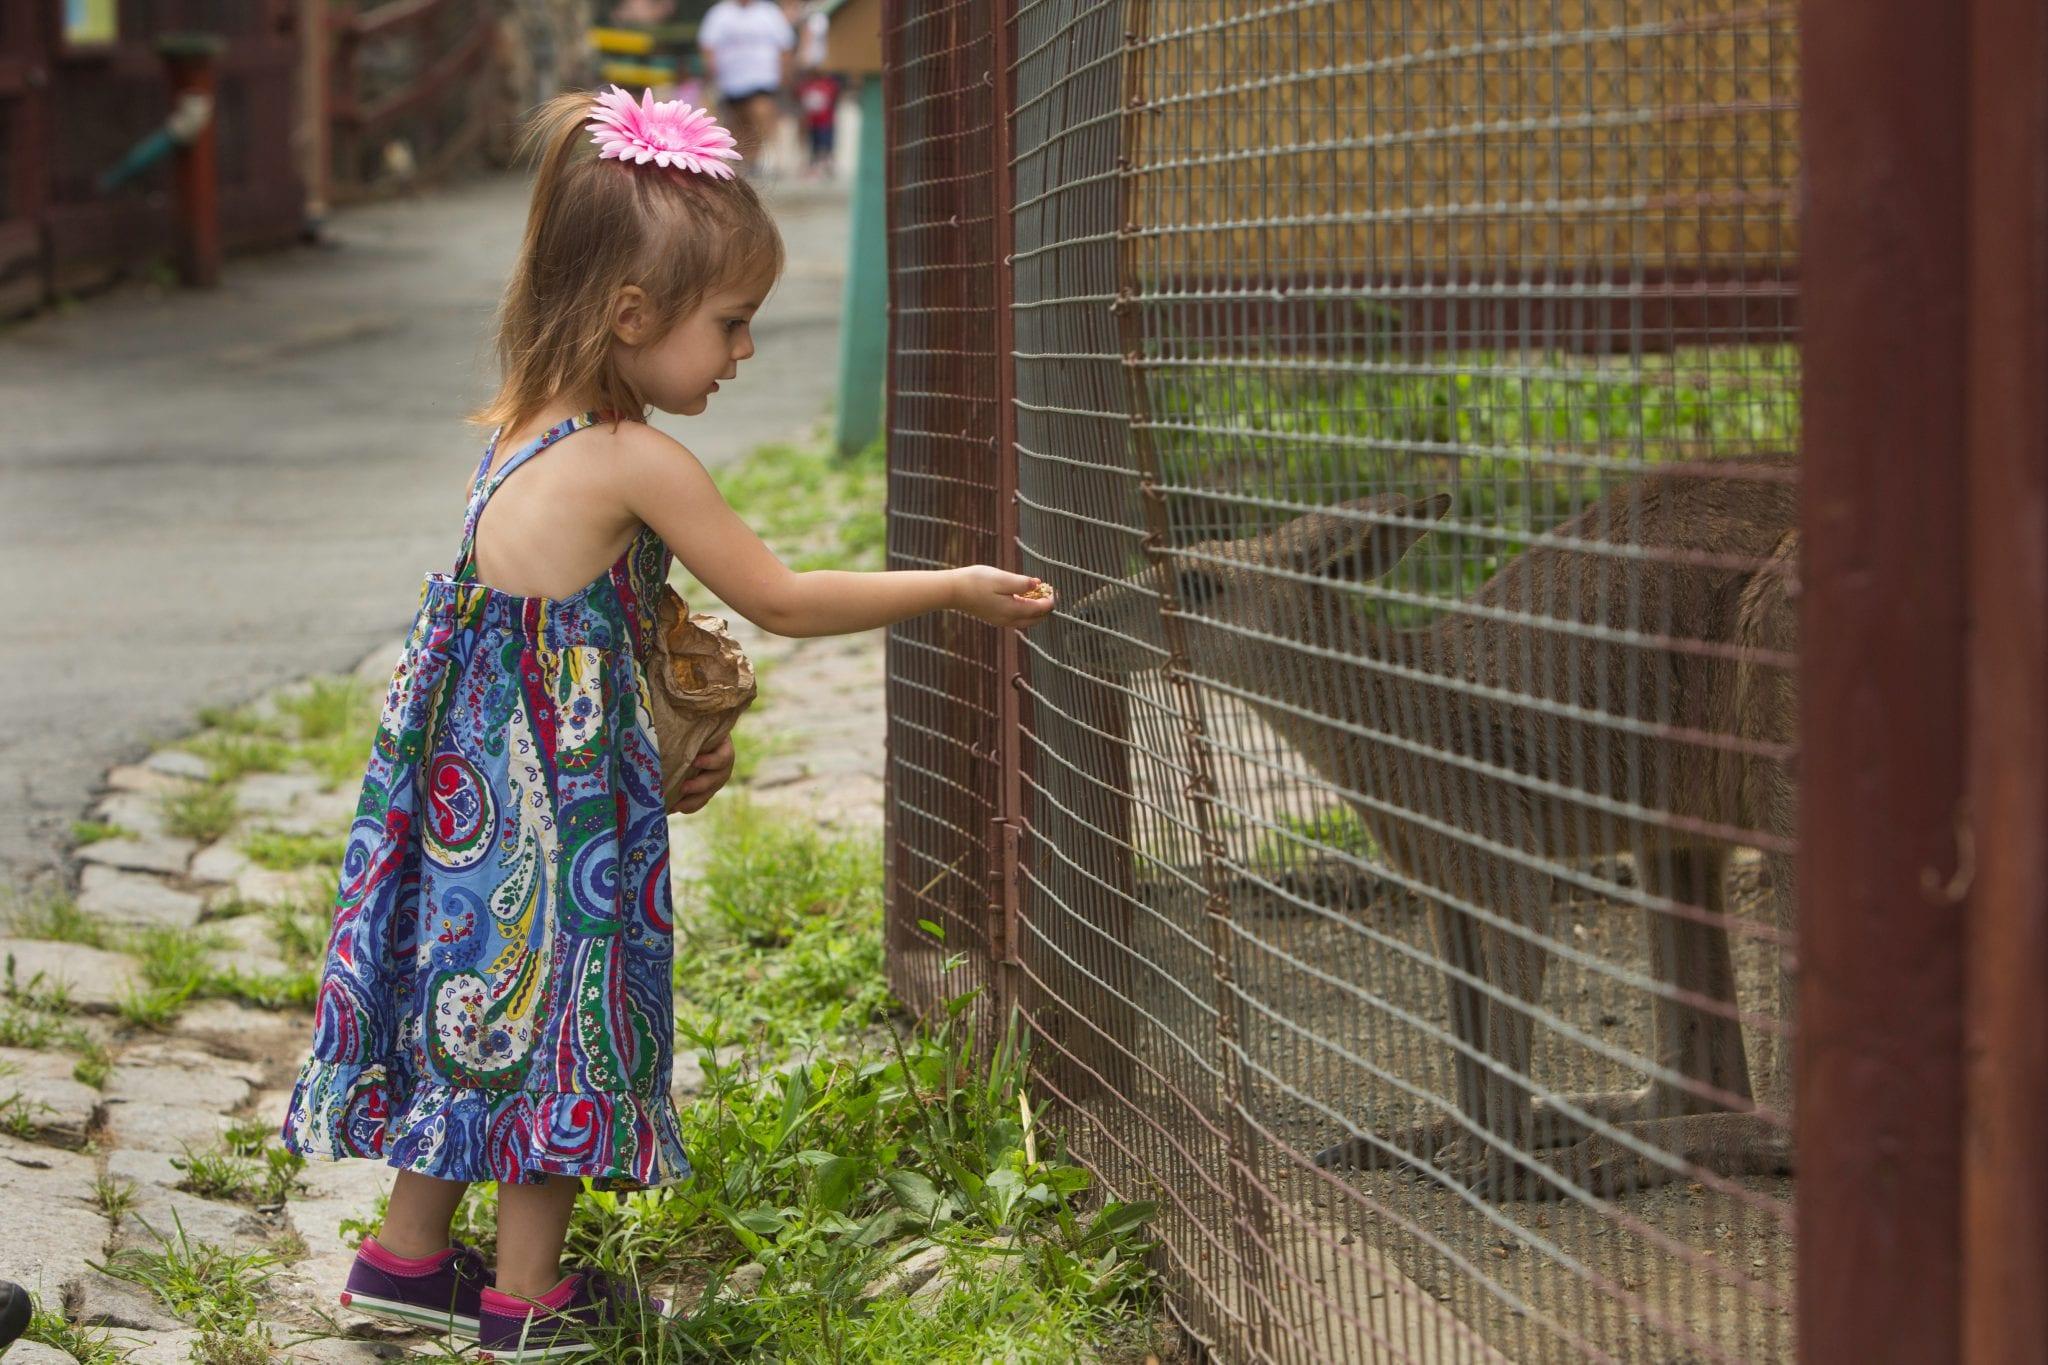 lupa-zoo-explorewesternmass.com